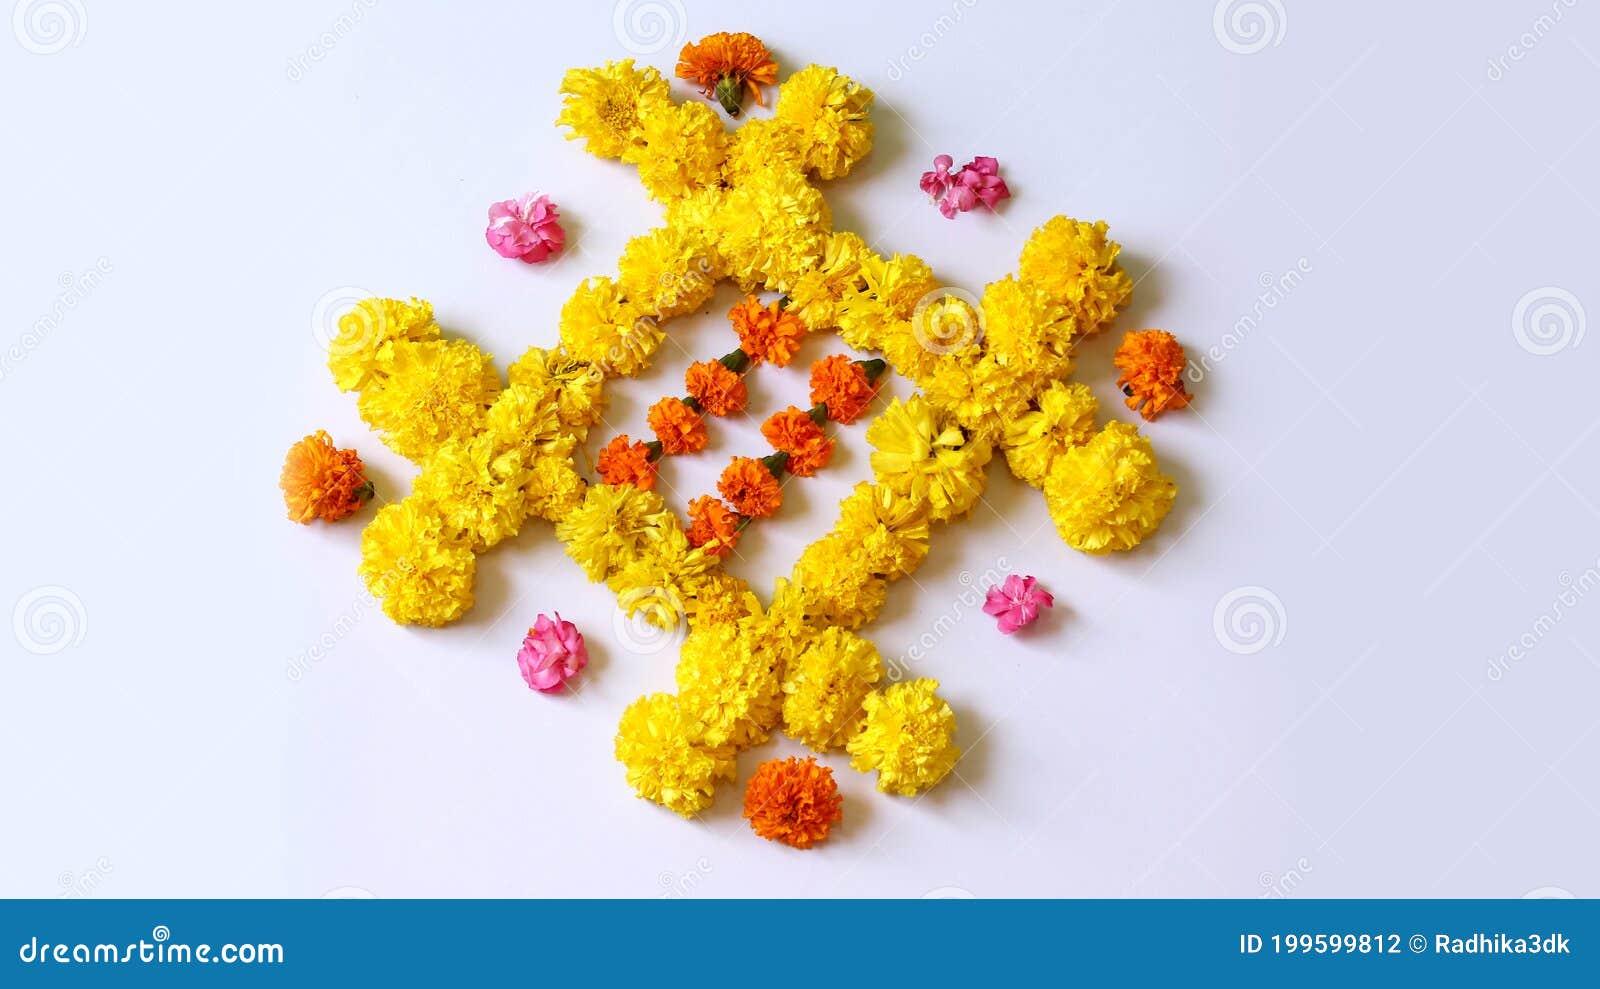 Flower Rangoli Designs For Diwali Festival Traditional Background Stock Photo Image Of Cultural Deepavali 199599812